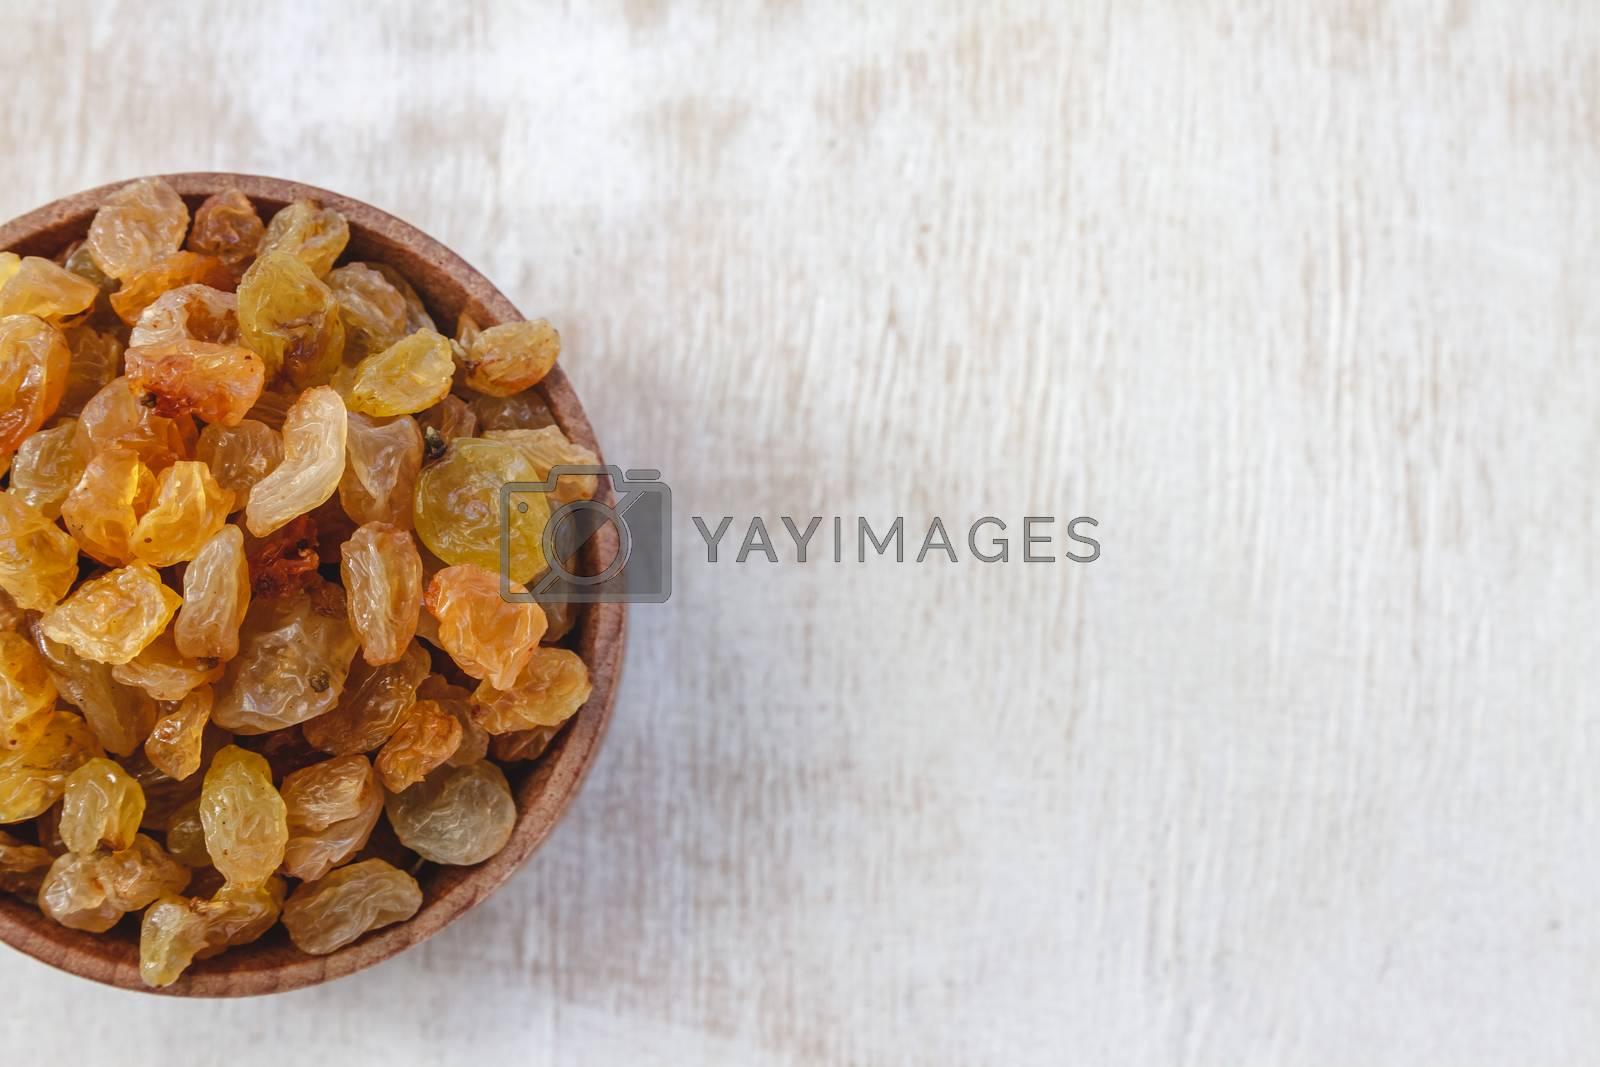 Light yellow raisins in a wooden bowl on a light white backgroun by Tanacha